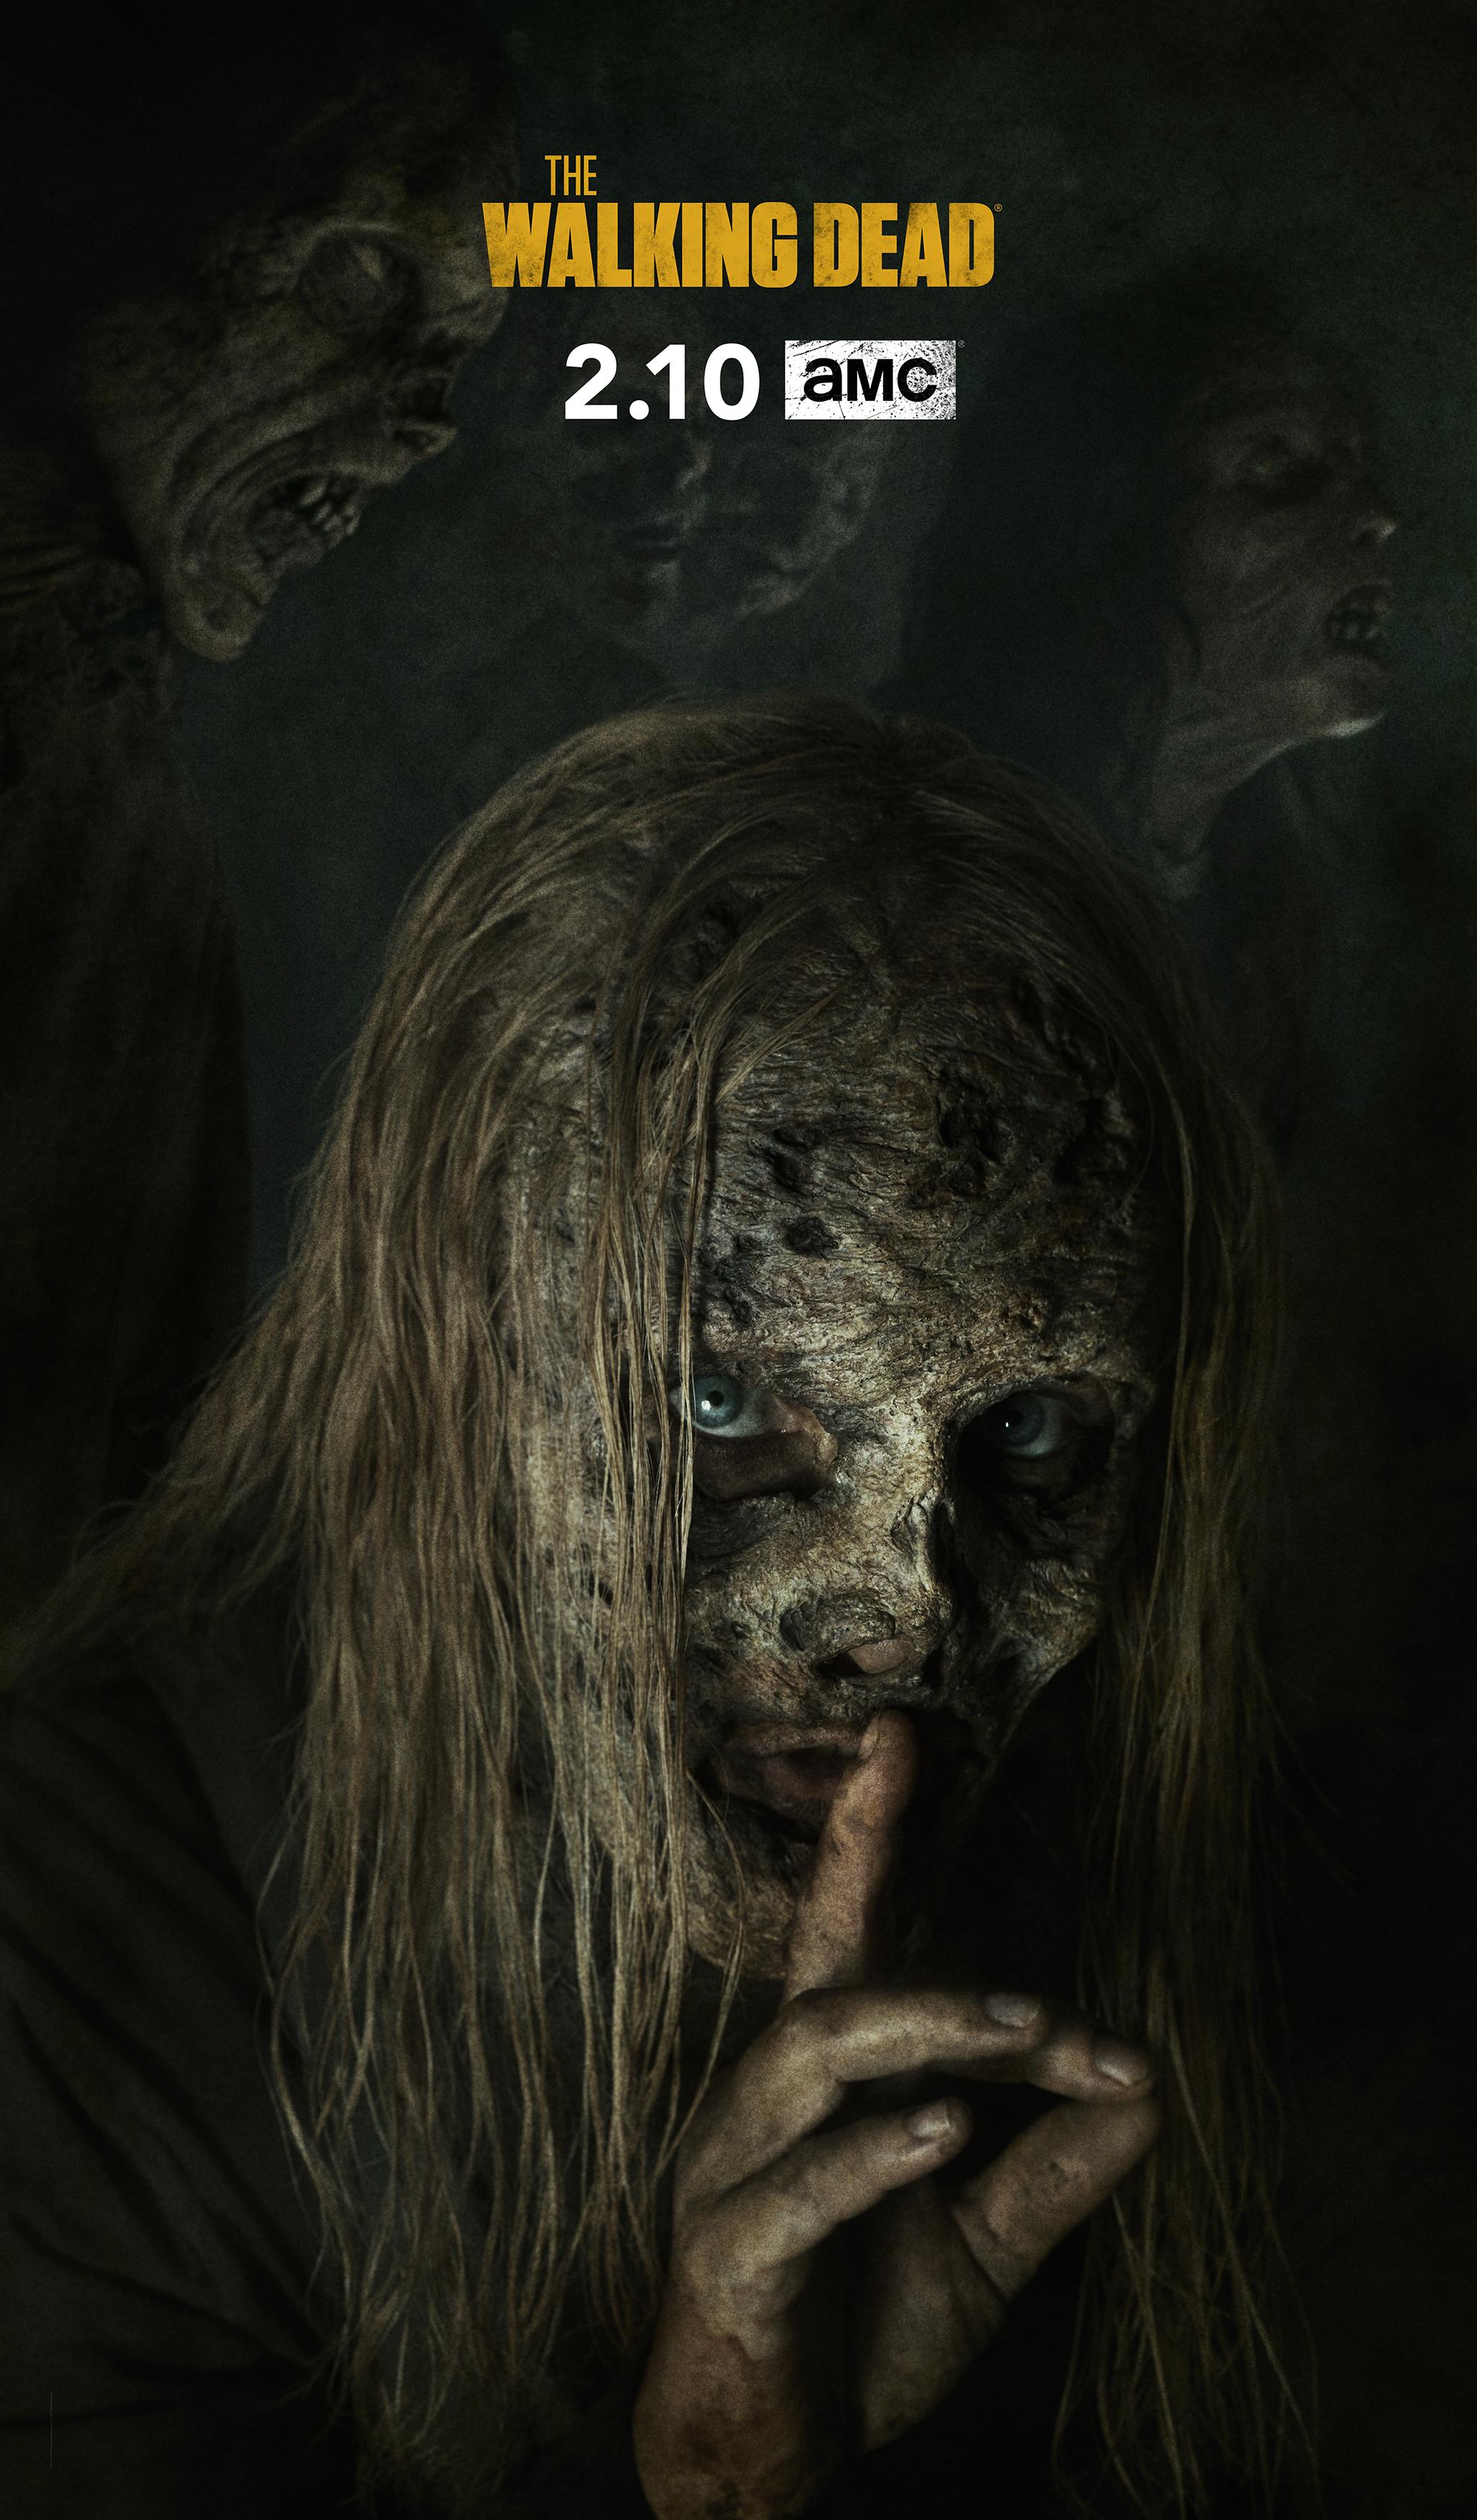 Walking Dead Season 9 Whisperer